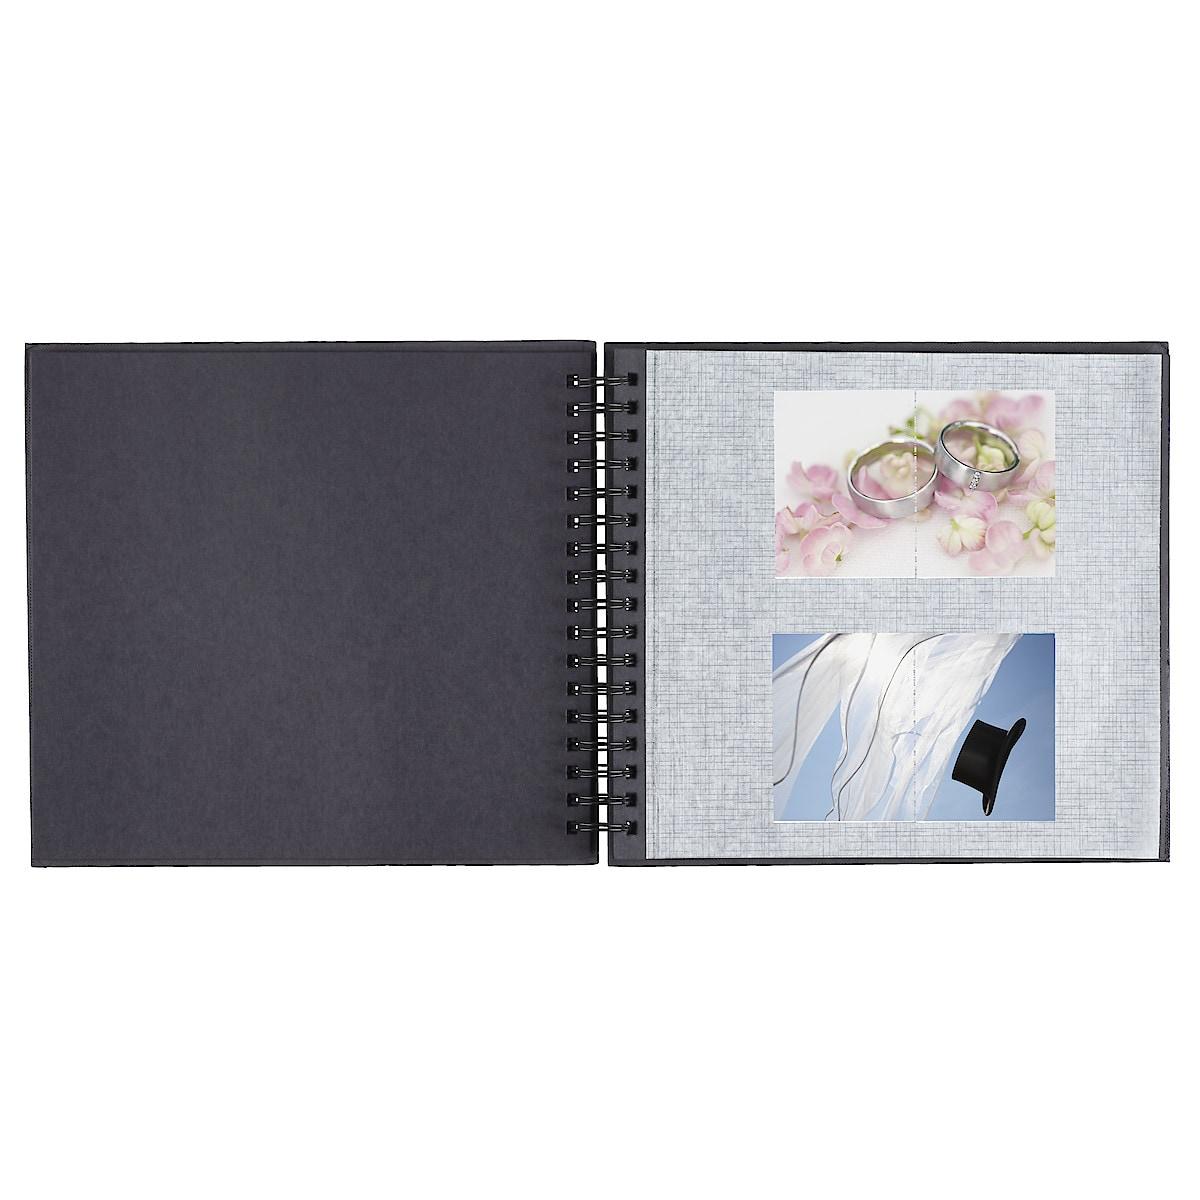 Fotoalbum zum Einkleben